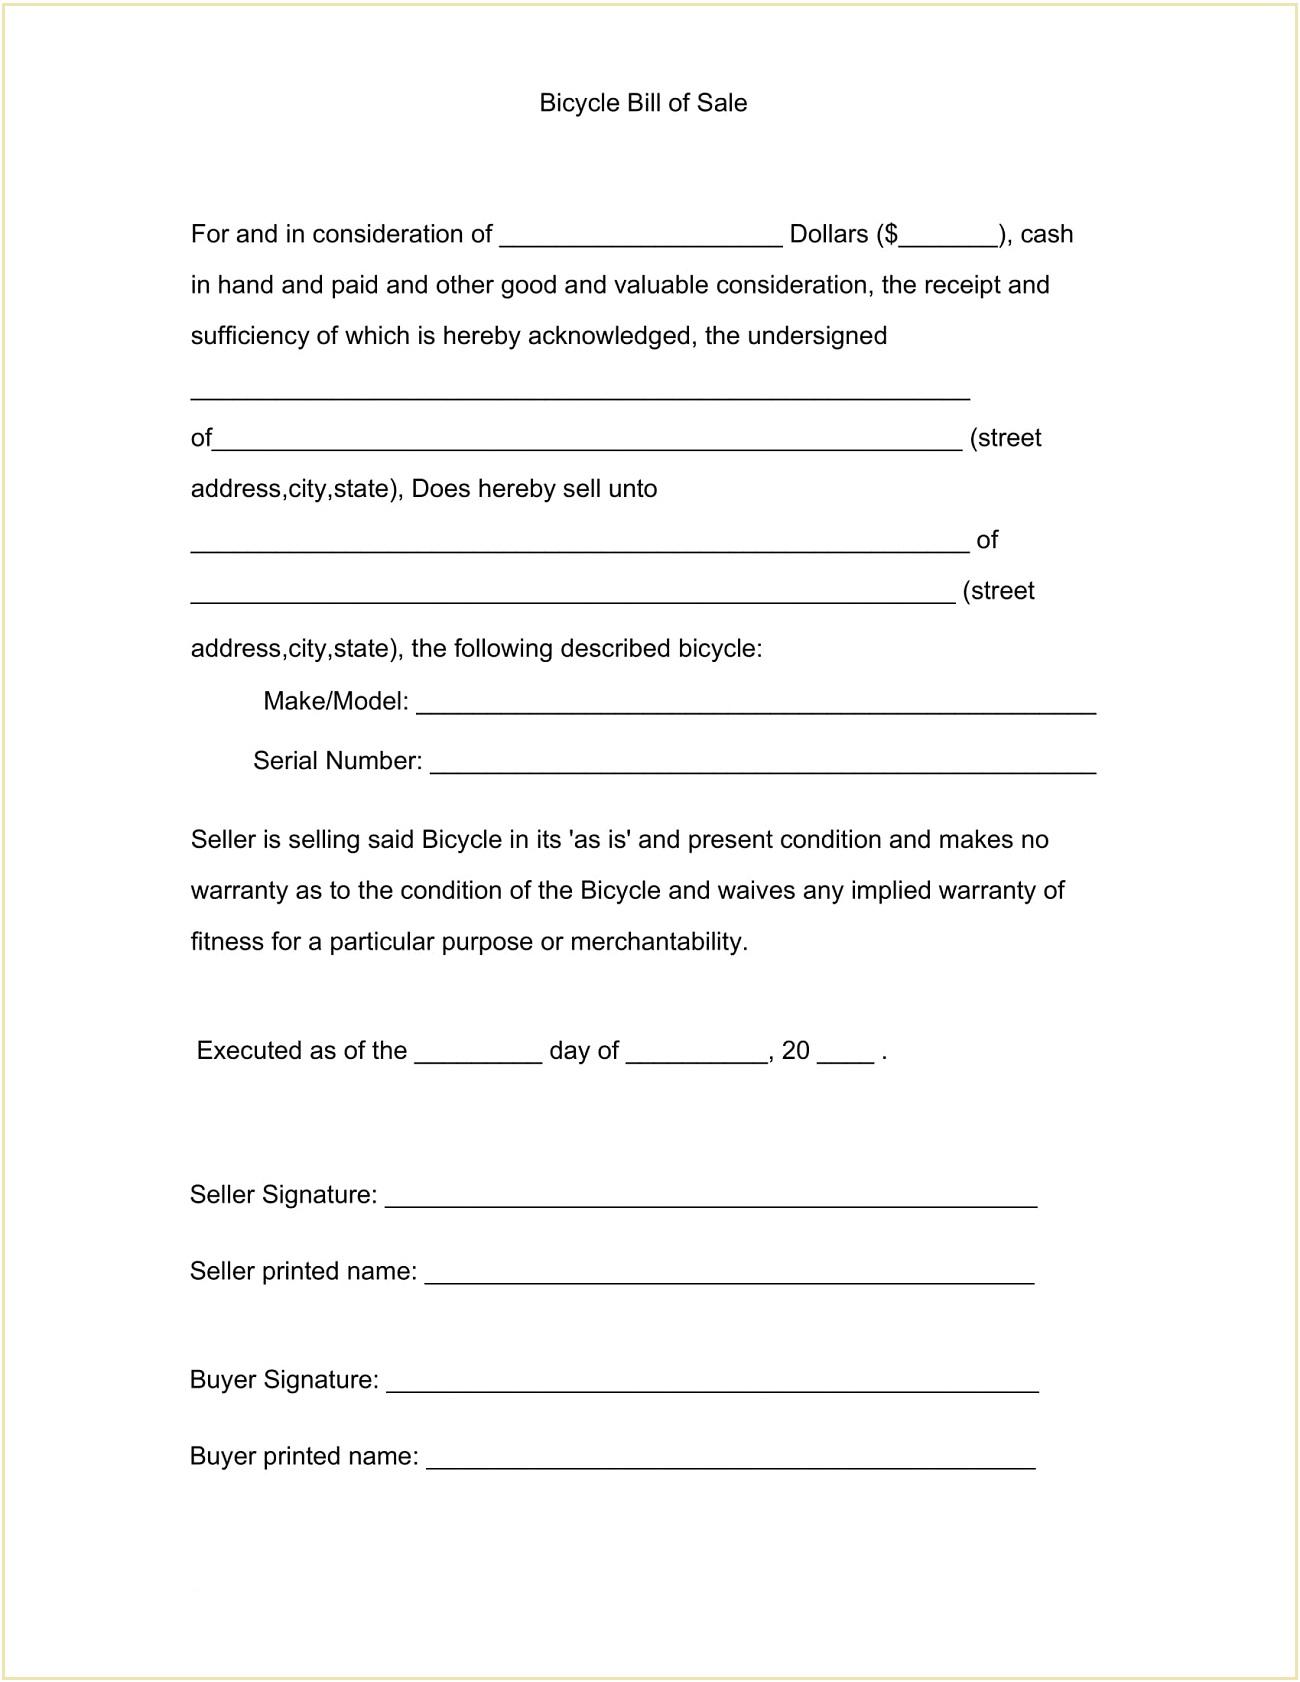 Bike Bill of Sale Format PDF